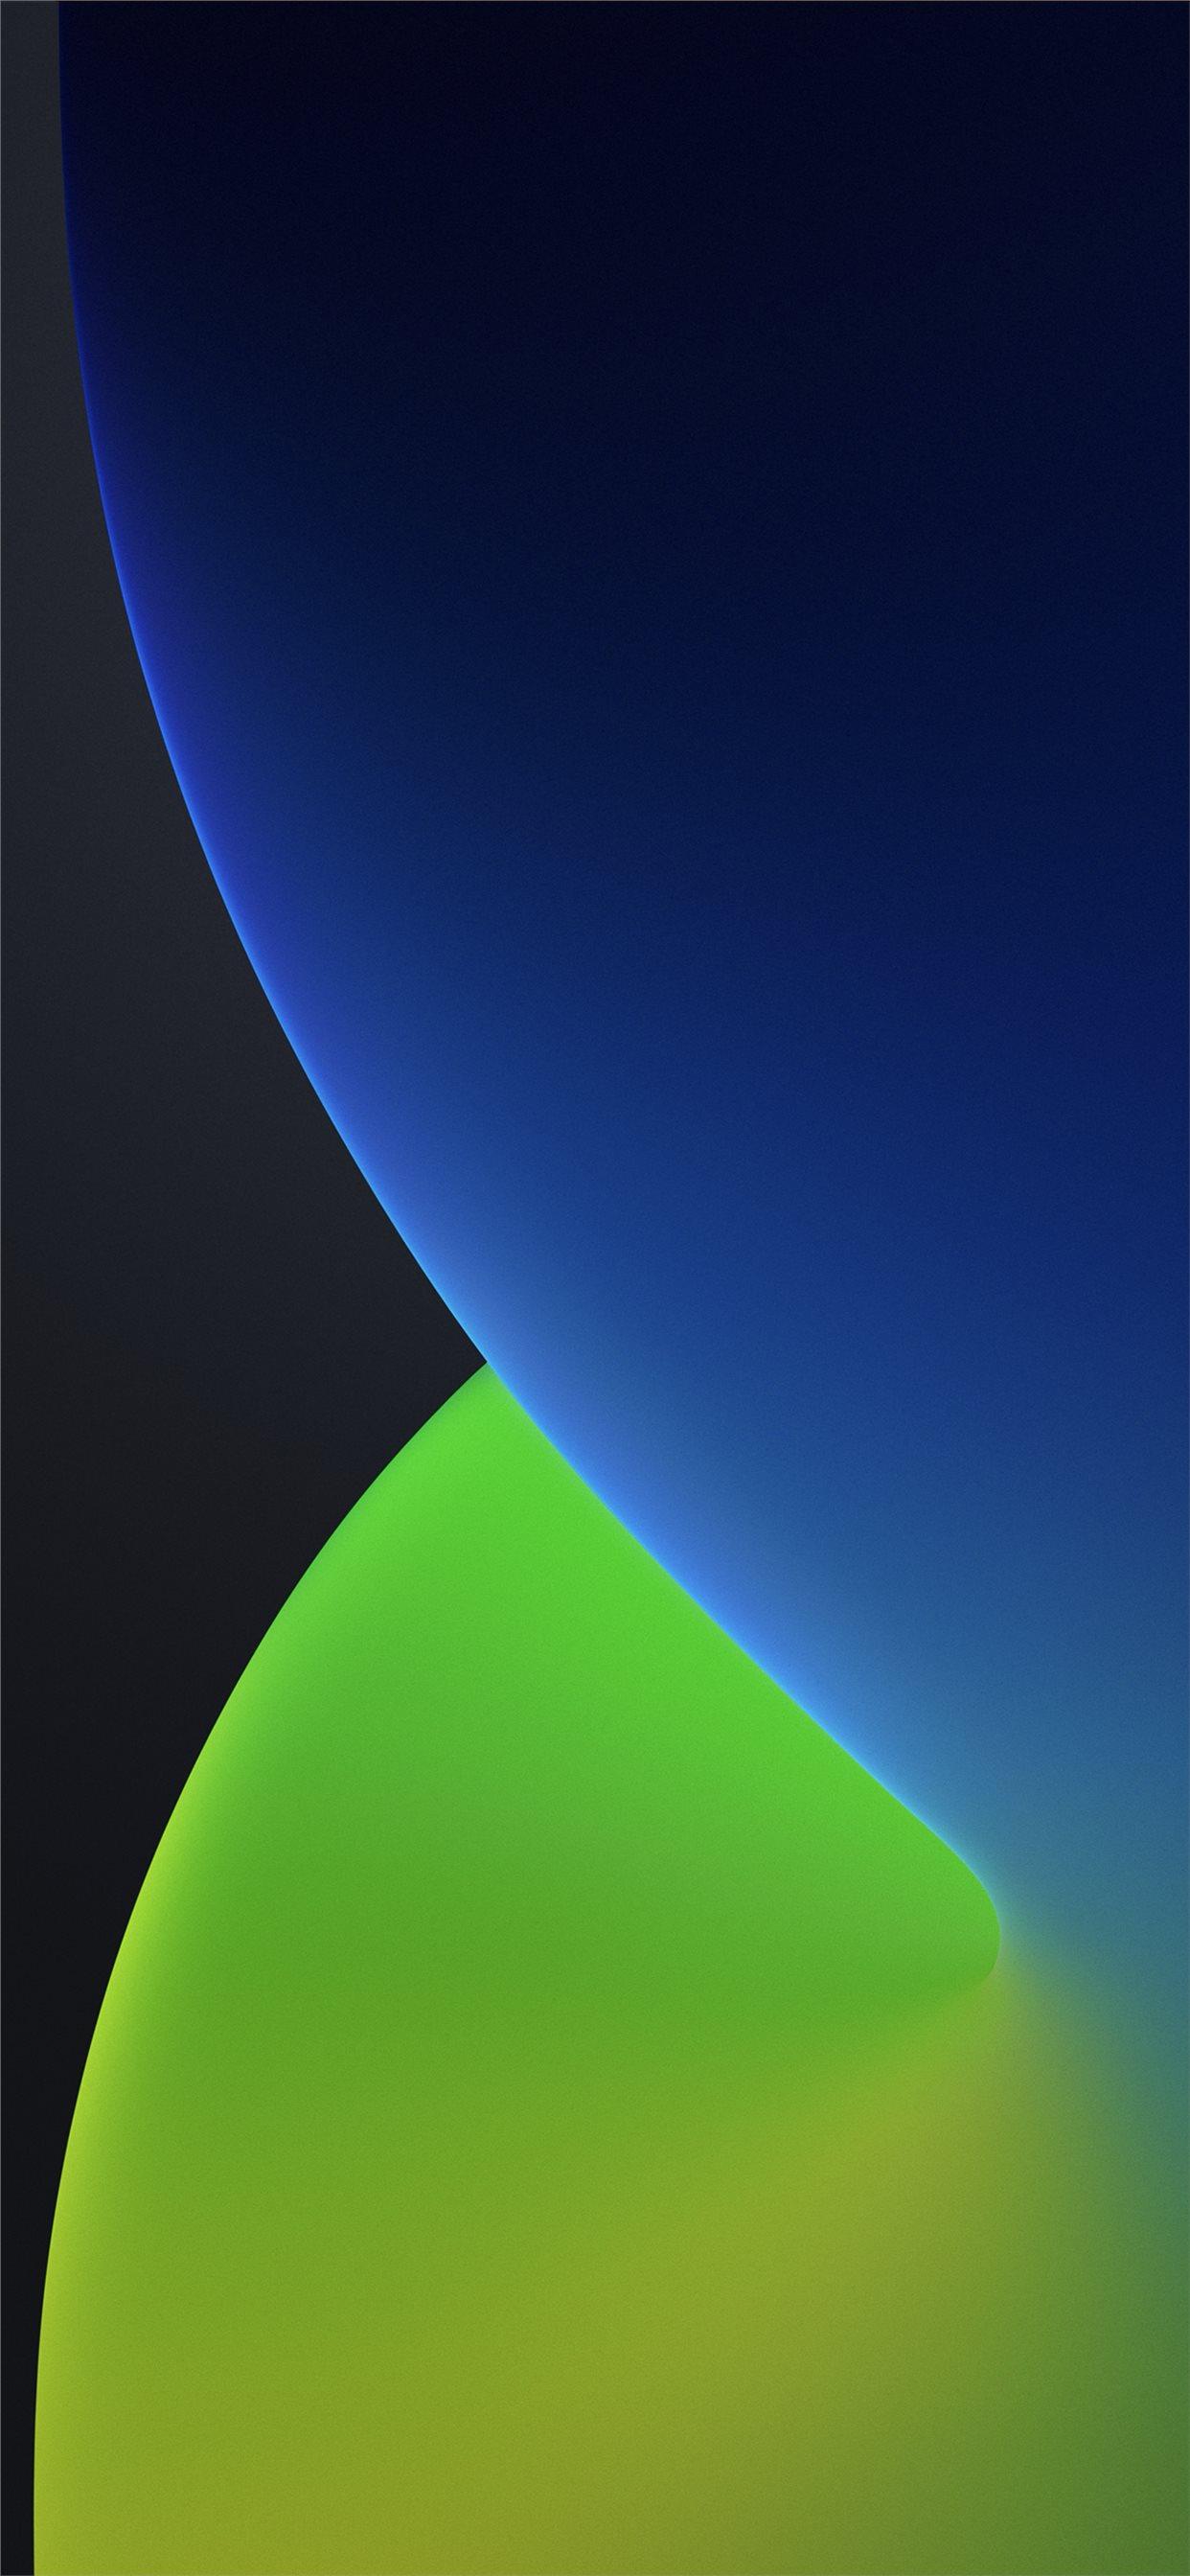 Ios 14 Stock Wallpaper Cool Dark Iphone Wallpapers Free Download